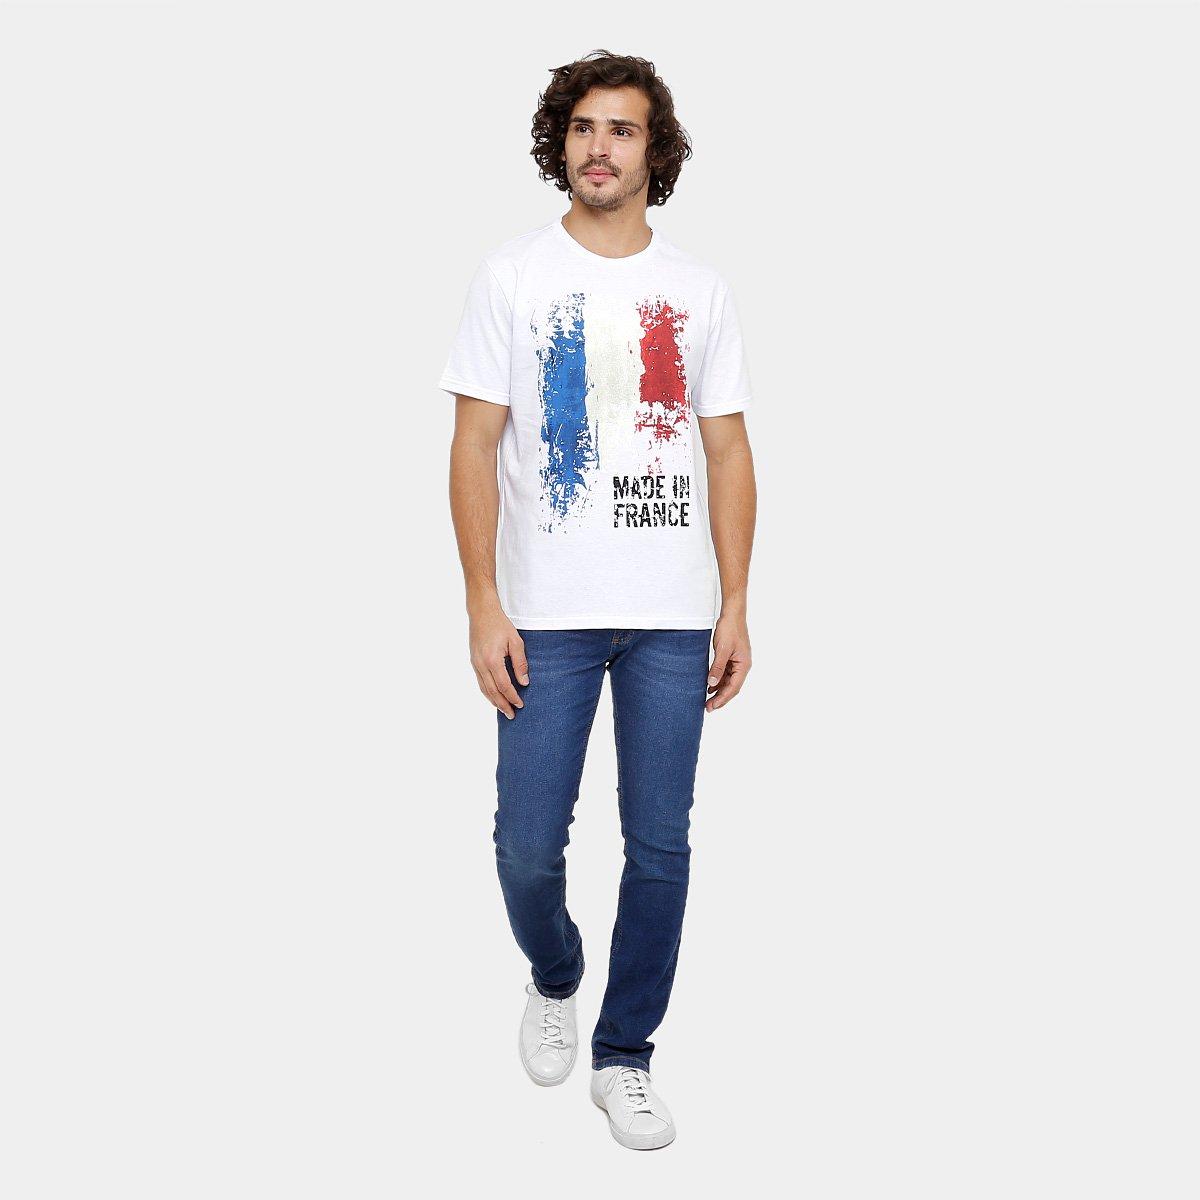 e2c7ba7f40cfc Camiseta Burn França Masculina - Compre Agora   Zattini